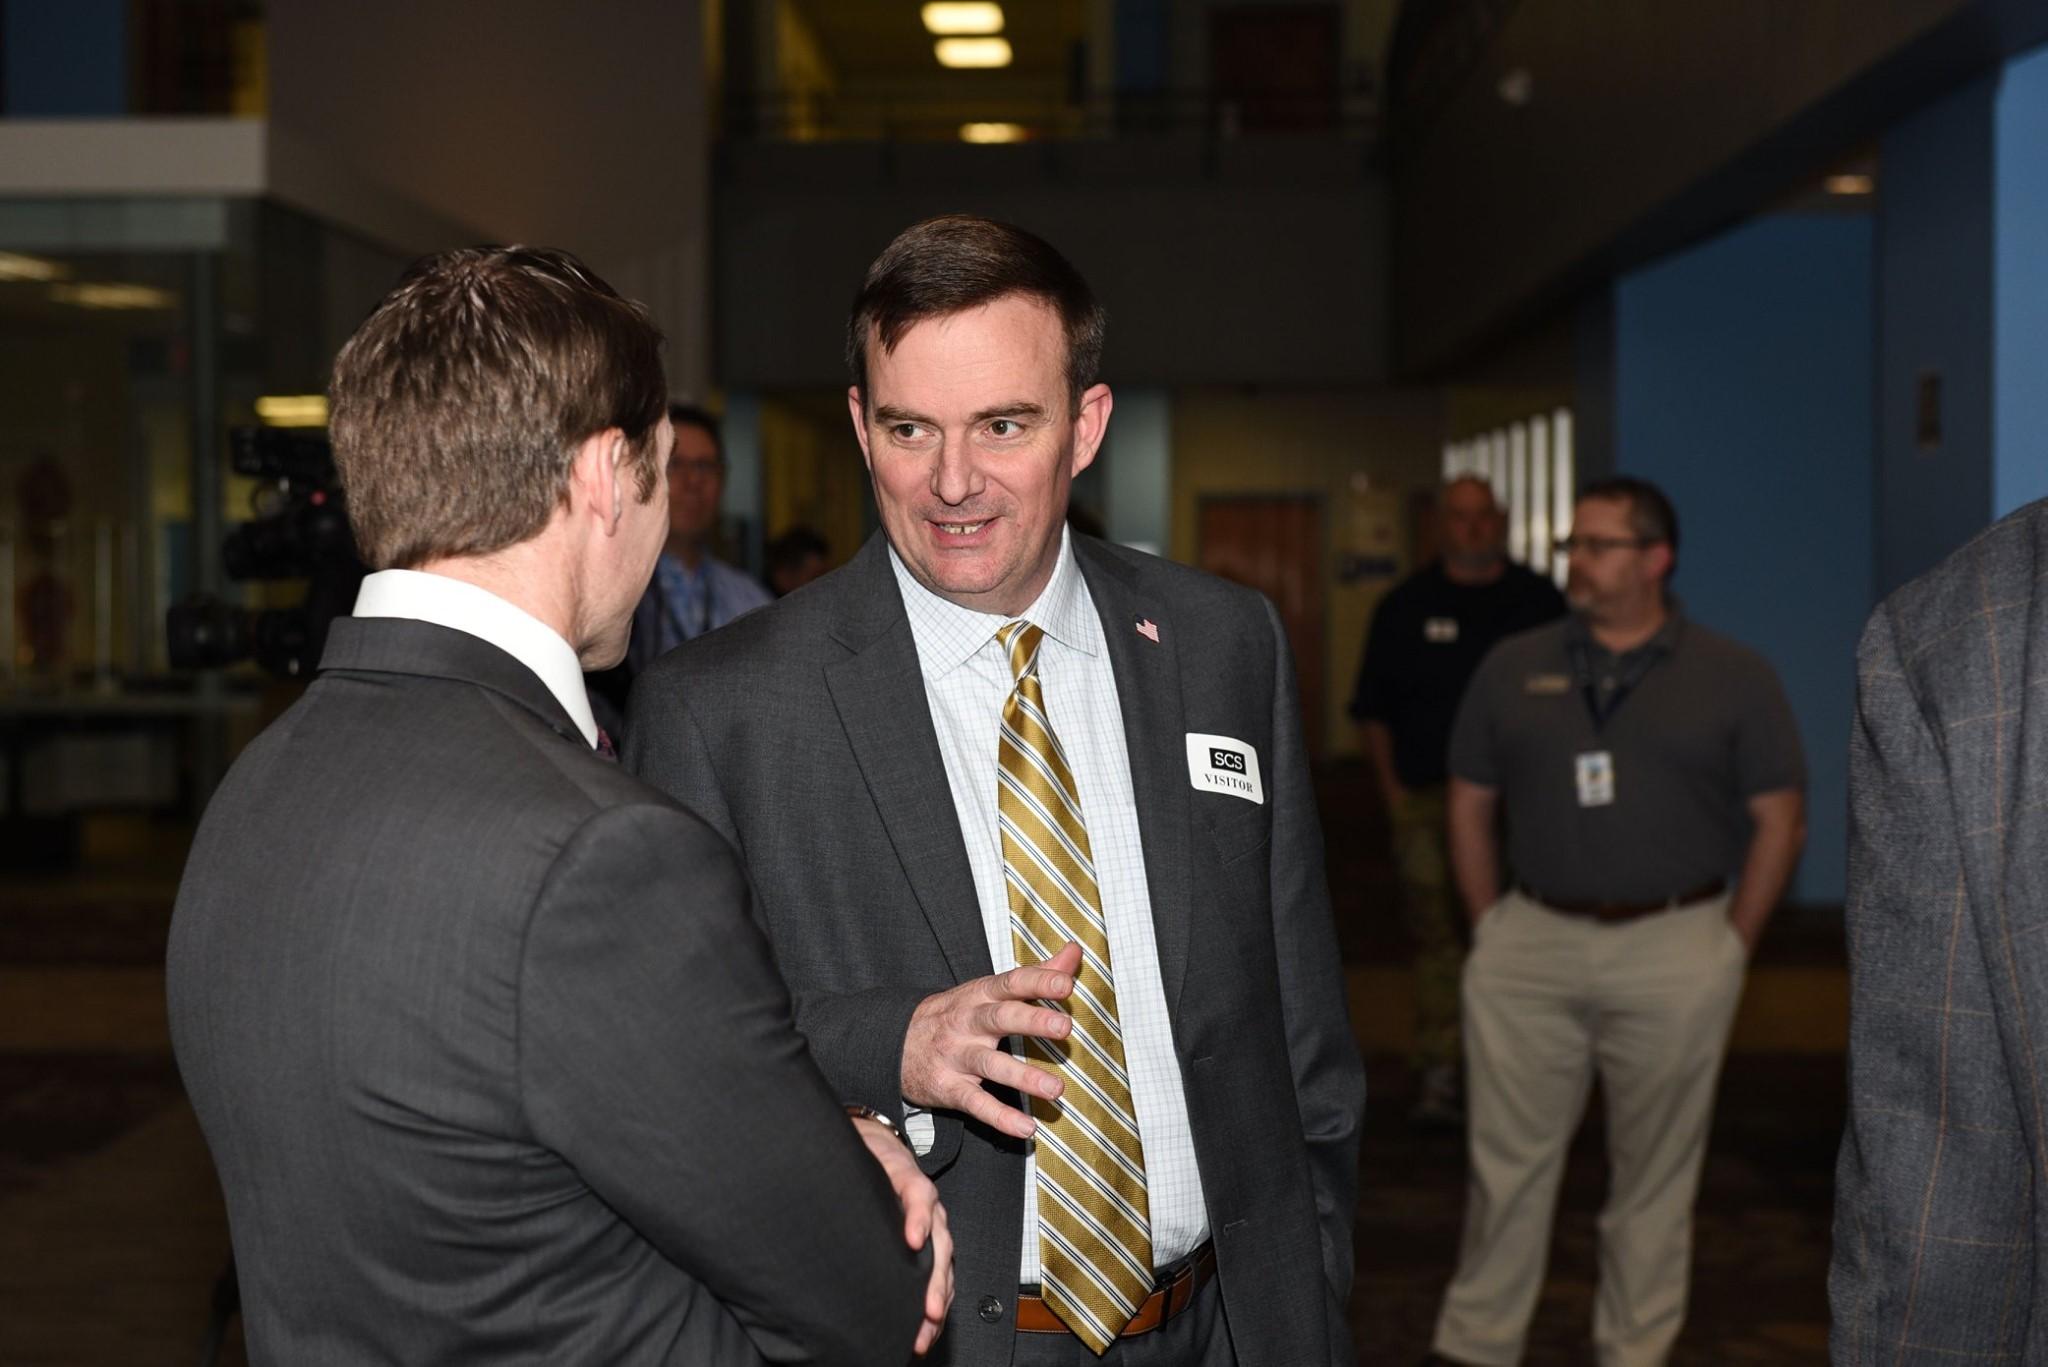 FITSNews – Greenville South Carolina Sheriff's Involvement In U.S. Senate Race Stokes Controversy